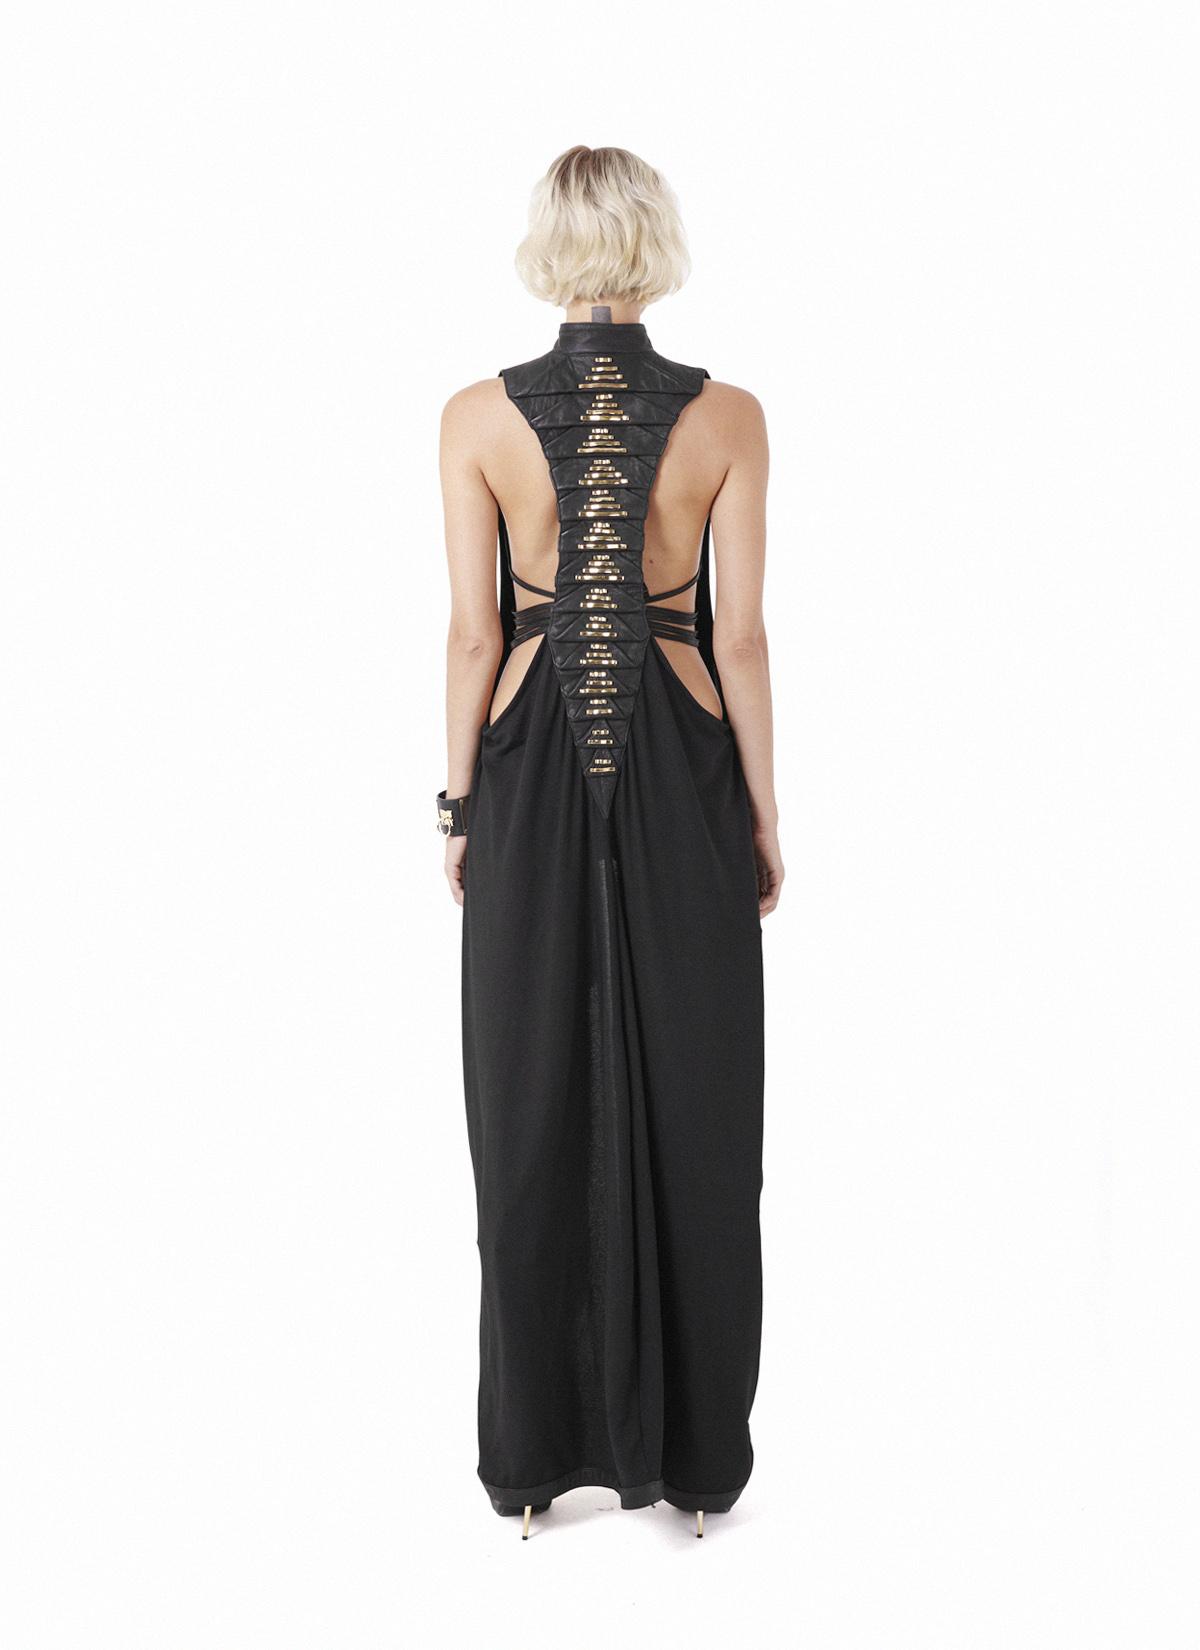 Sillias robe